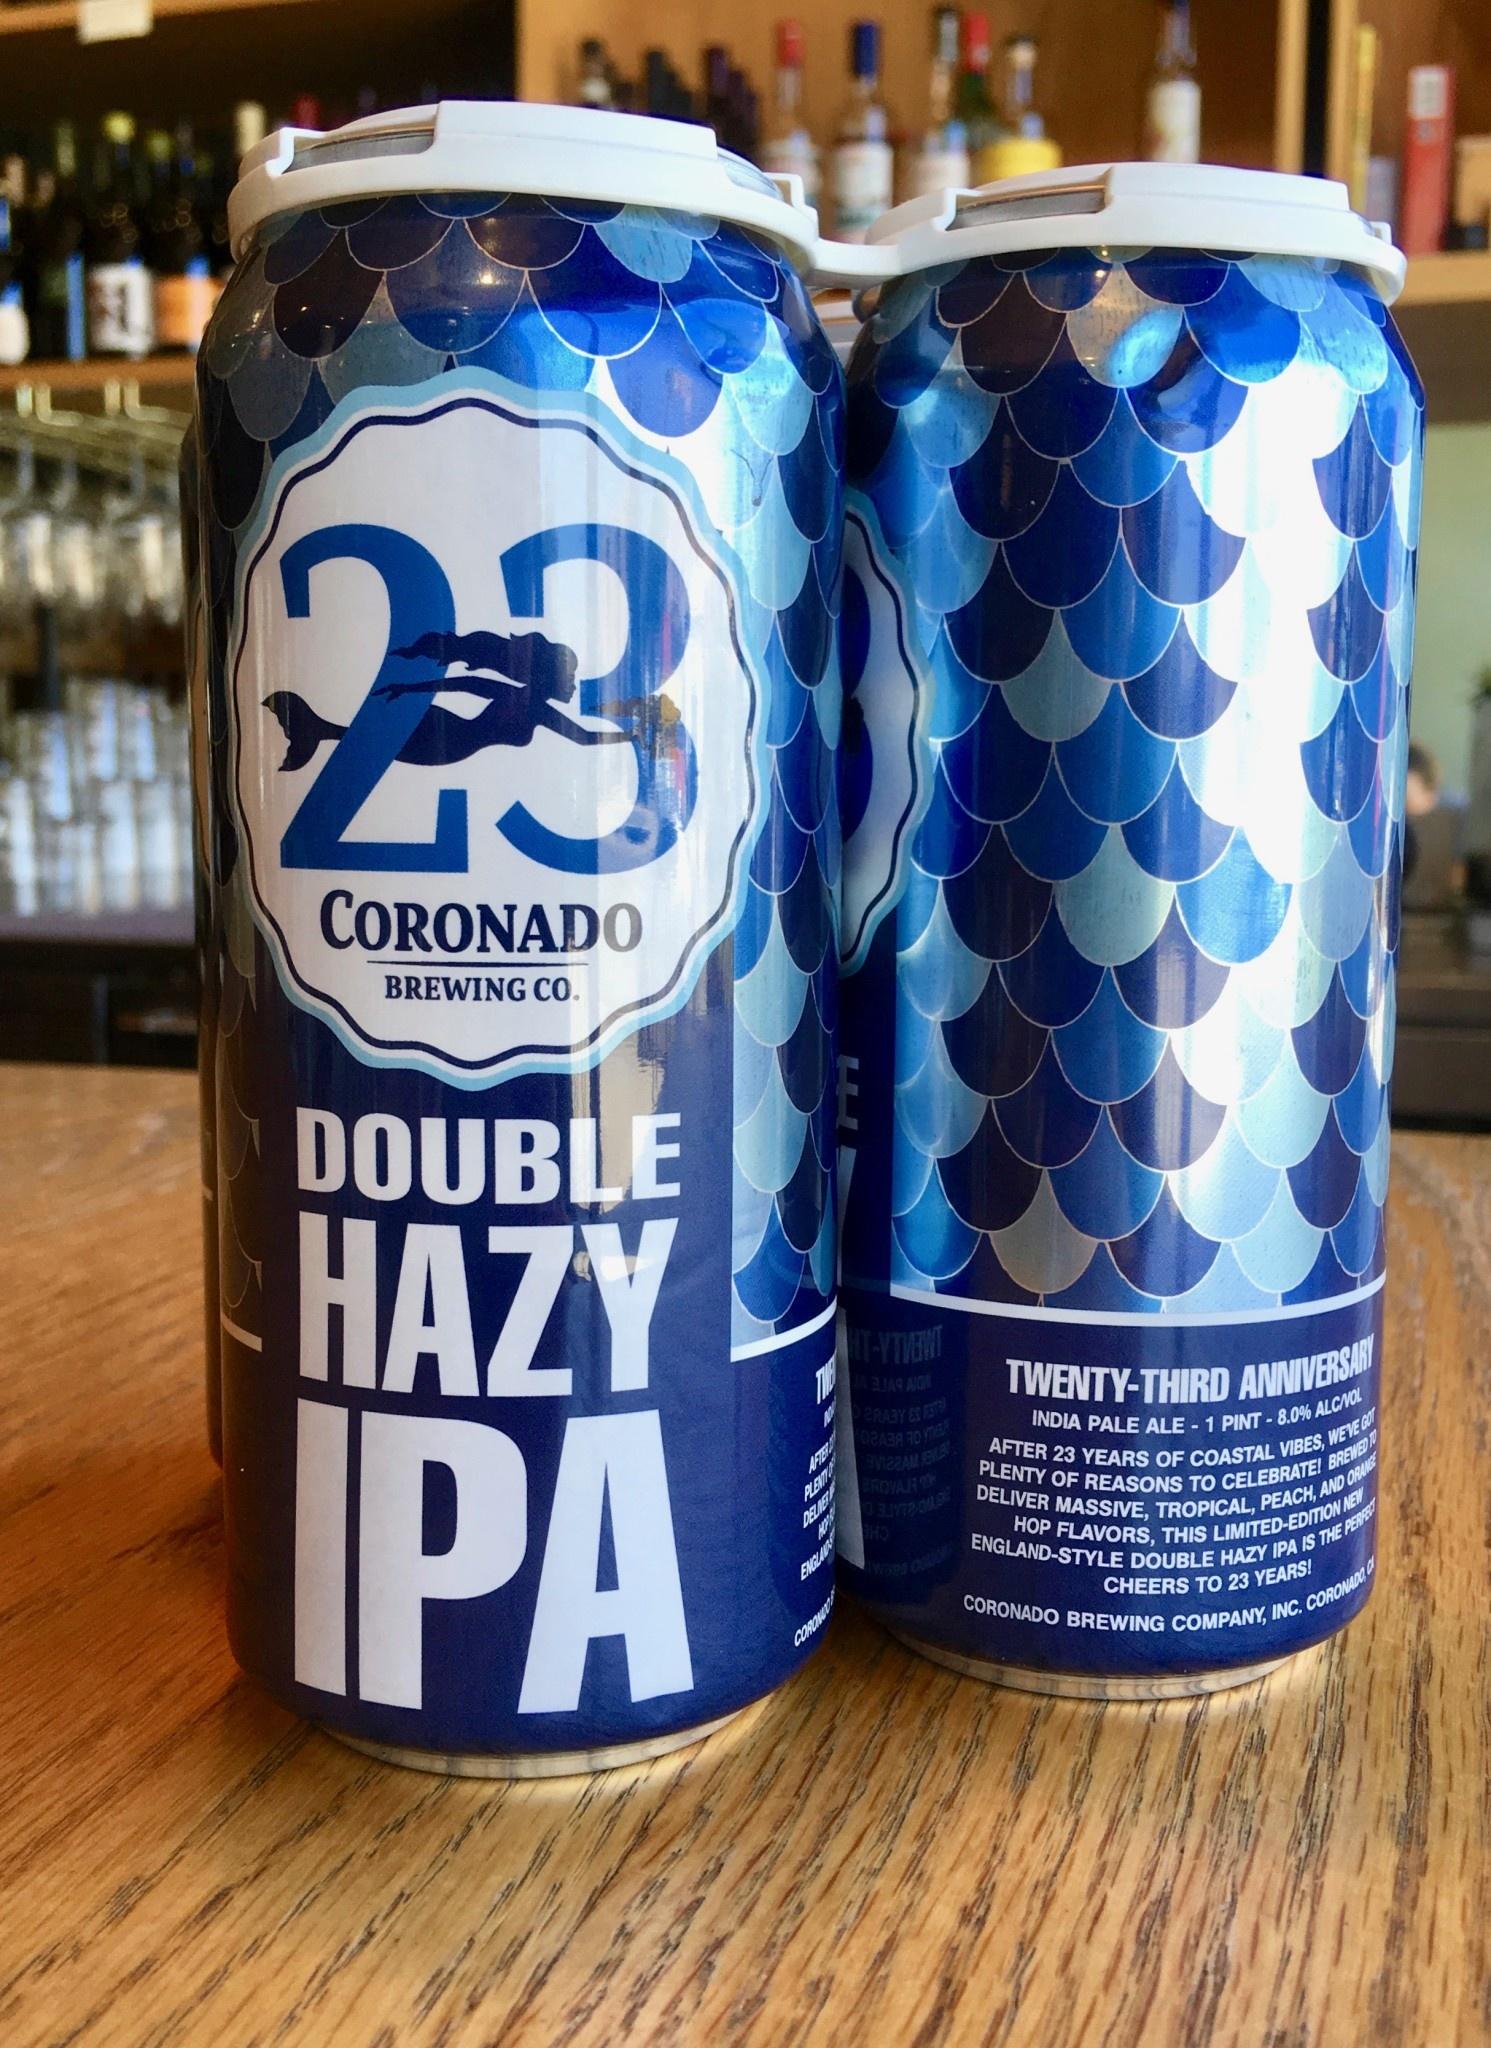 Coronado Brewing Coronado Brewing Co. 23rd Anniversary Hazy DIPA 16oz 4pk